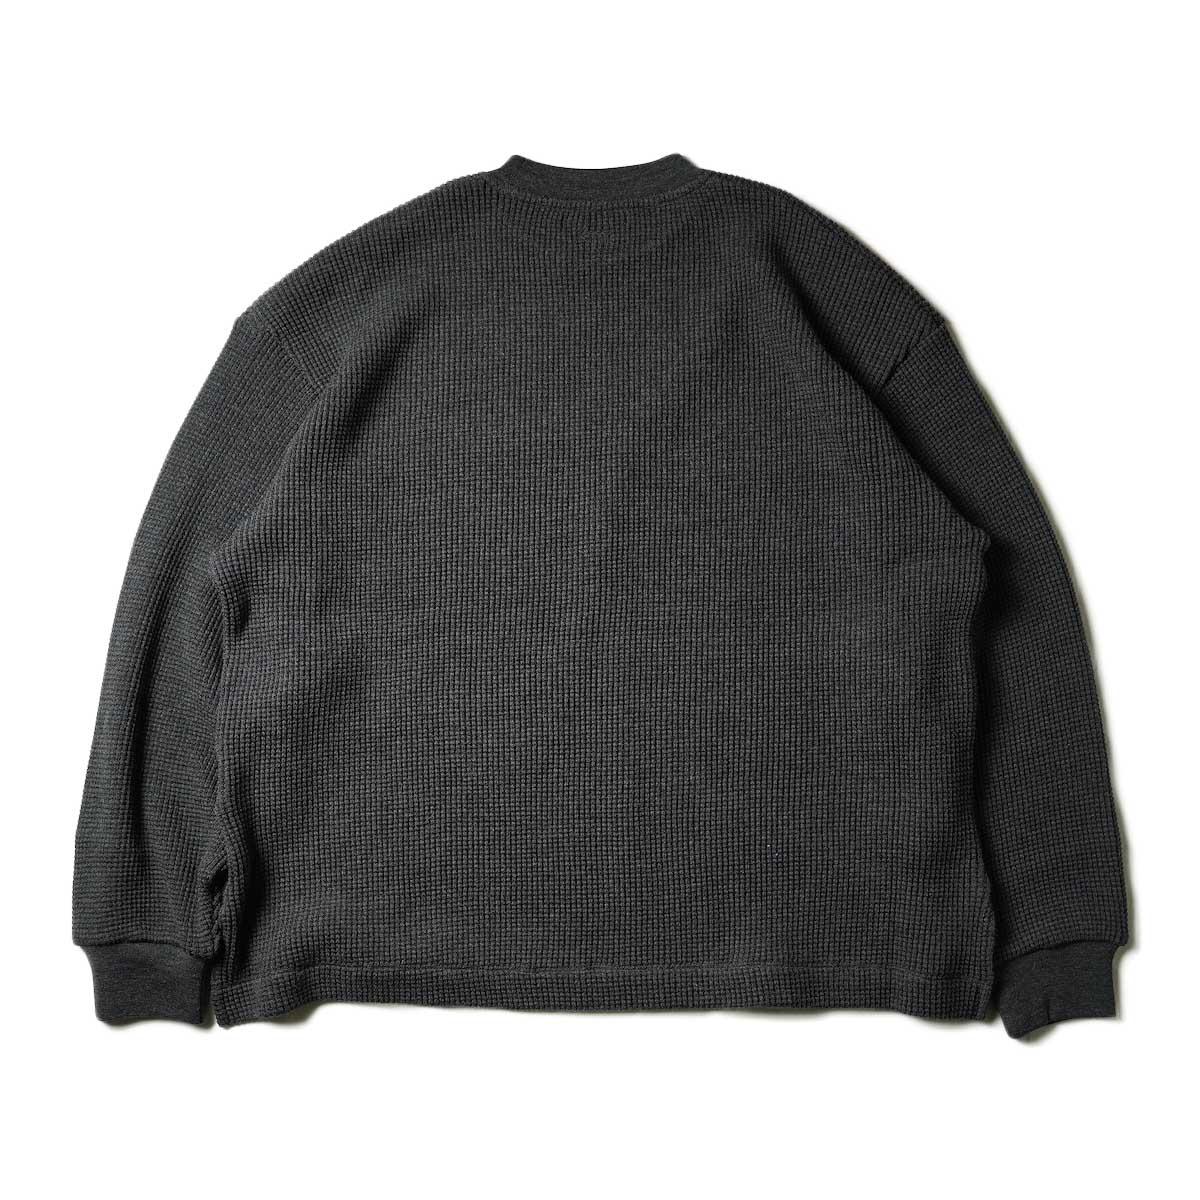 blurhms / Wool Cotton Big Waffle Crew-Neck (Heather Charcoal)背面